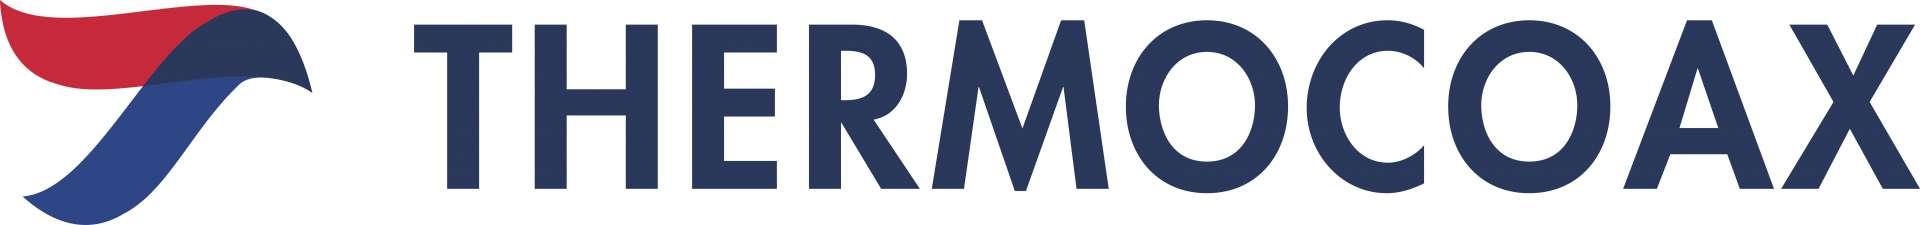 THERMOCOAX – Thermocoax reçoit le label fournisseur « Silver » de la part de Turbomeca